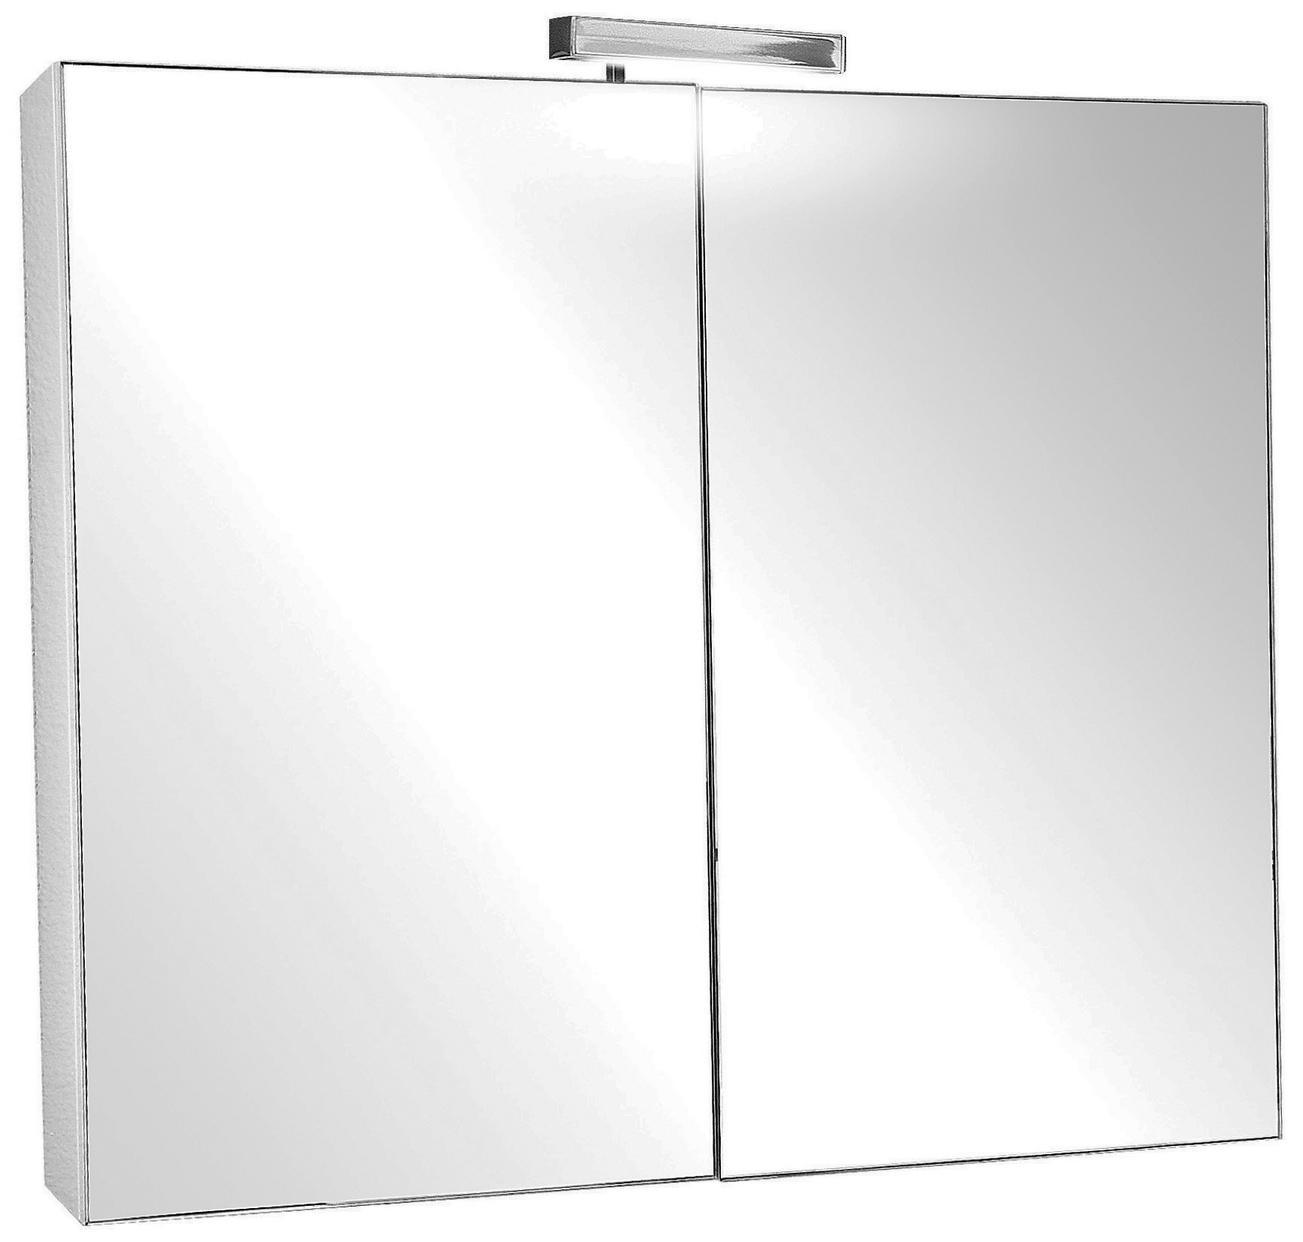 Зеркало-шкаф Jacob delafon Eb928-j5 presqu'ile